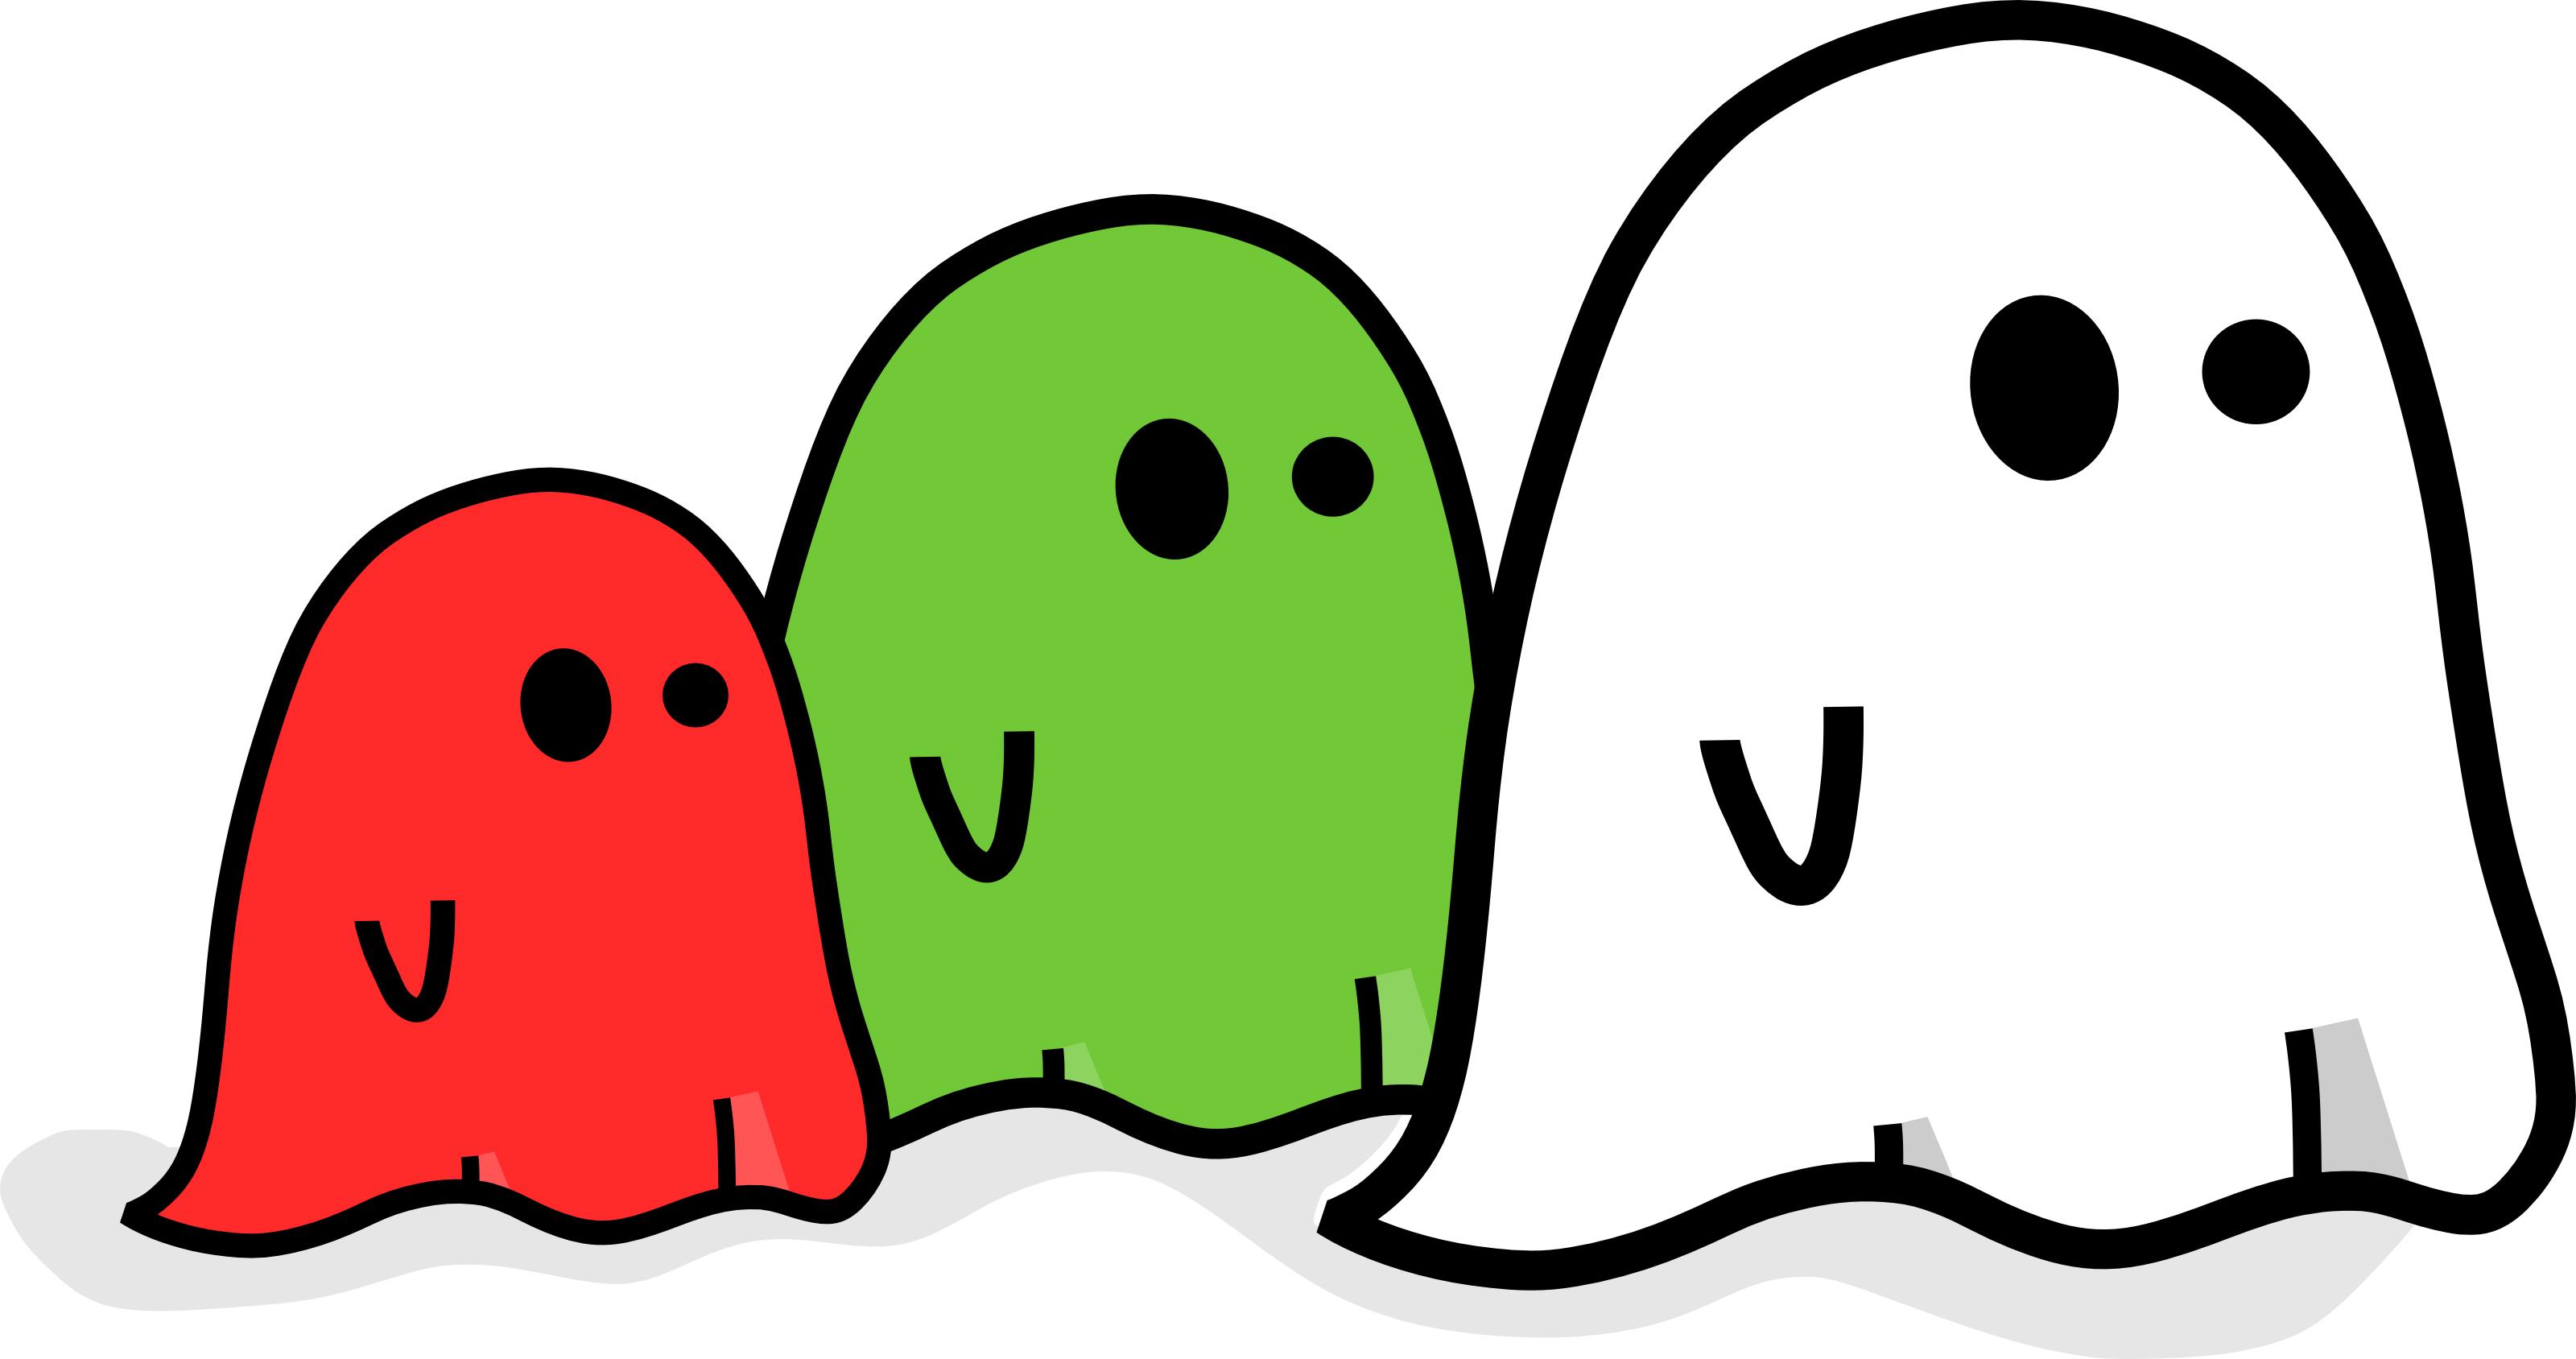 free vector halloween clipart - photo #4